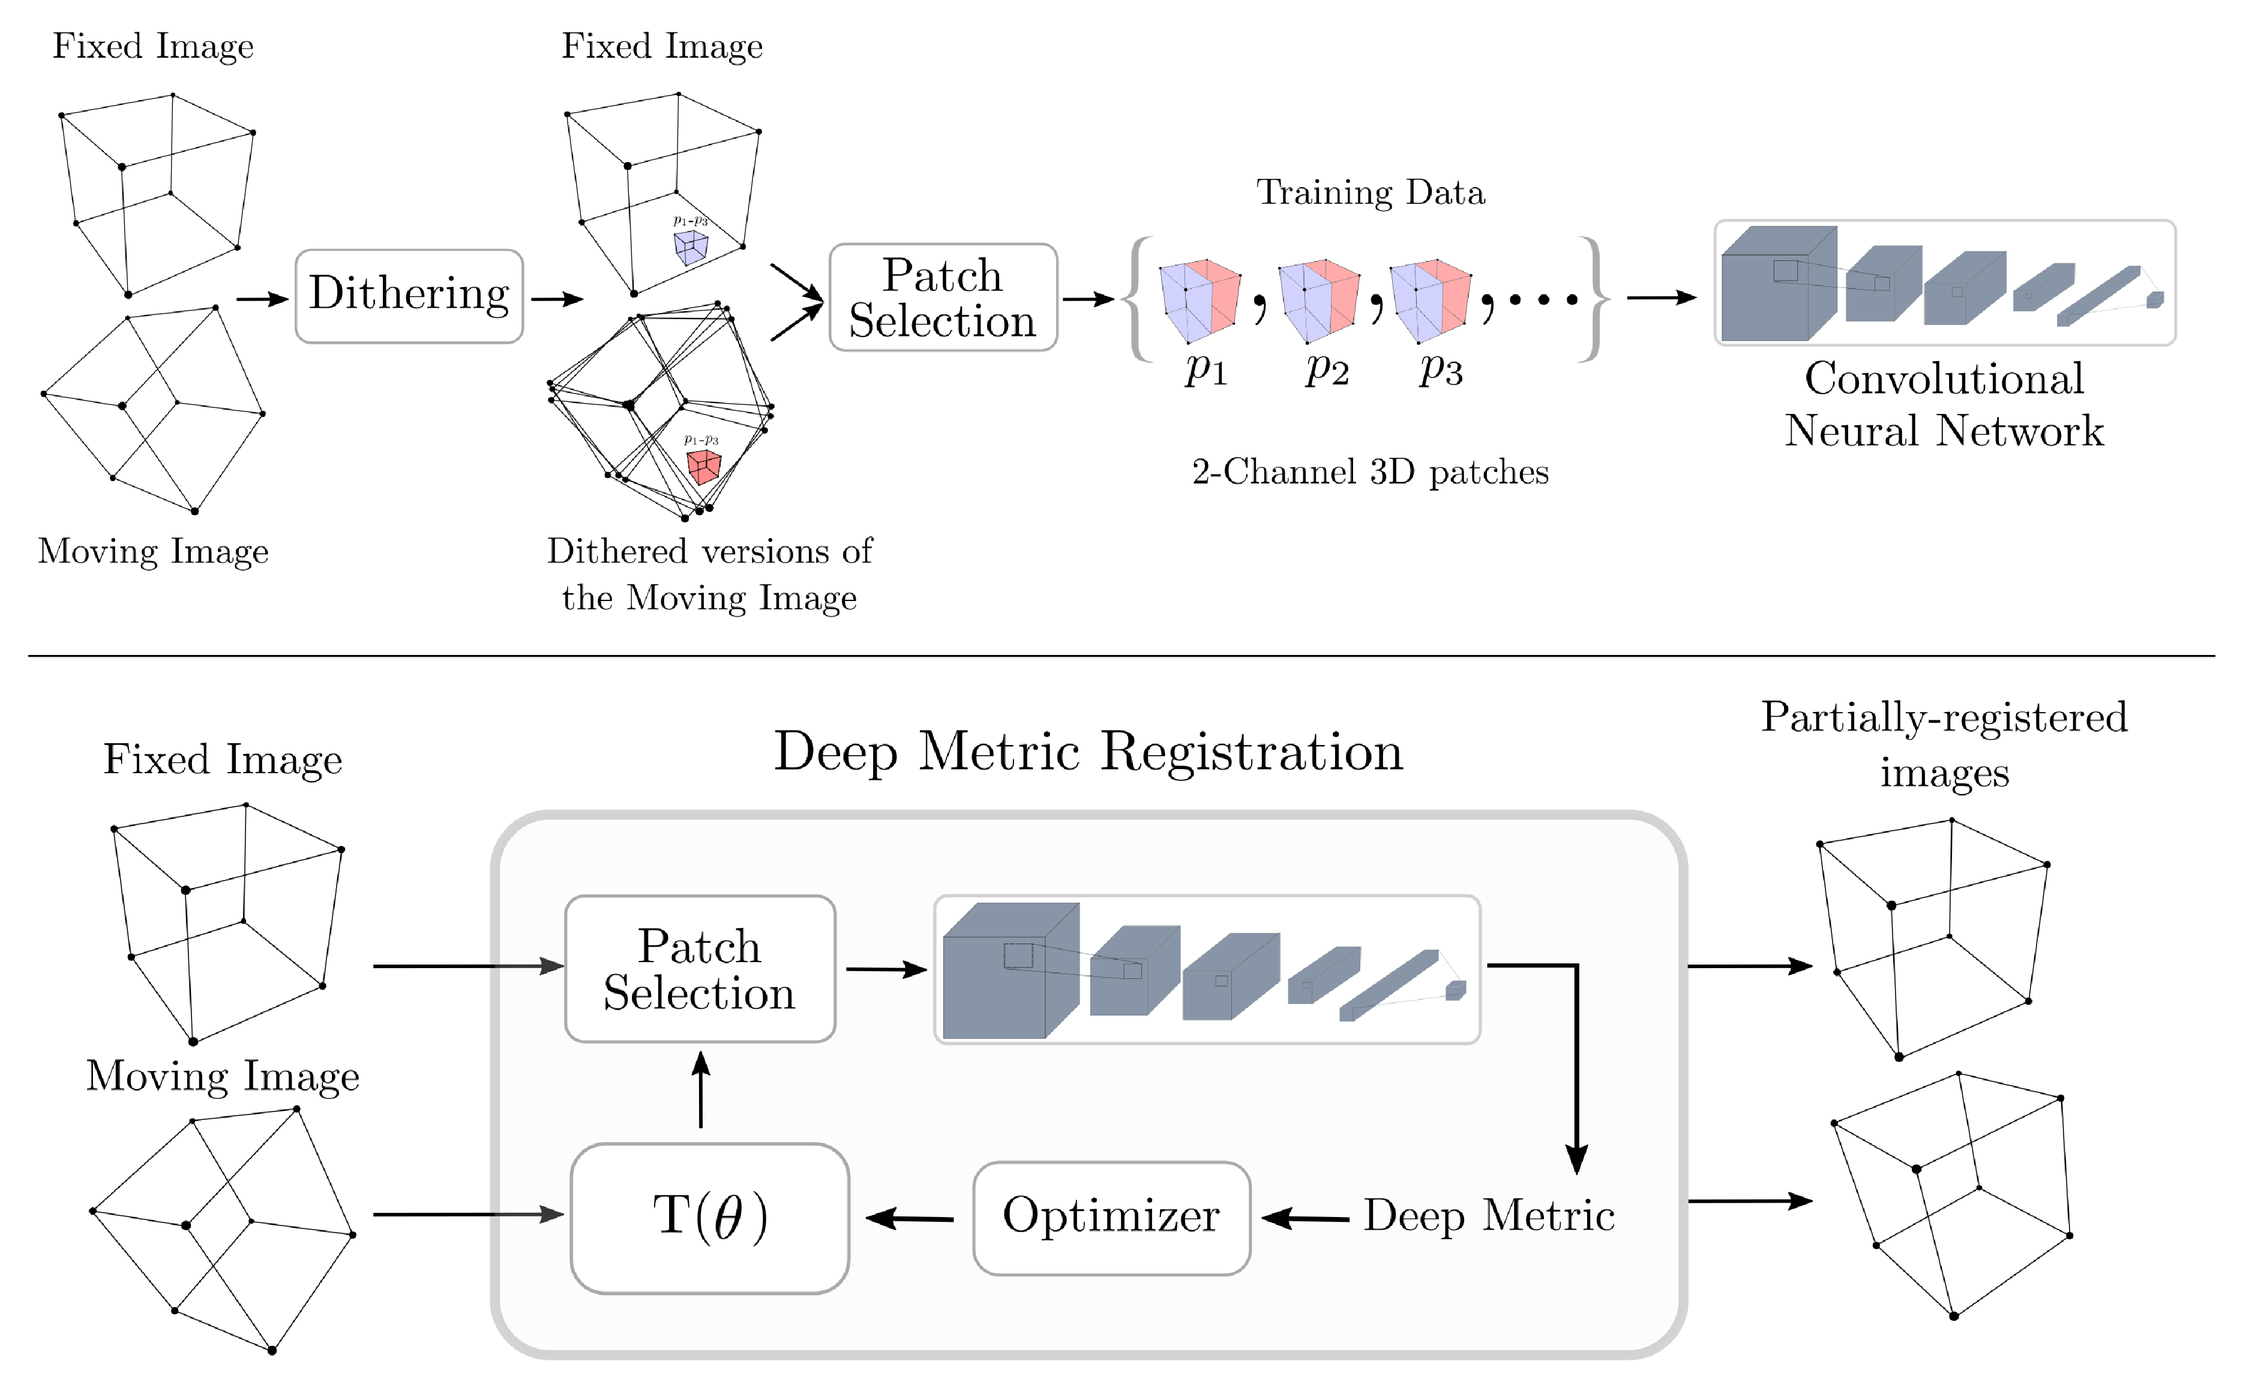 Semi-supervised image registration using deep learning